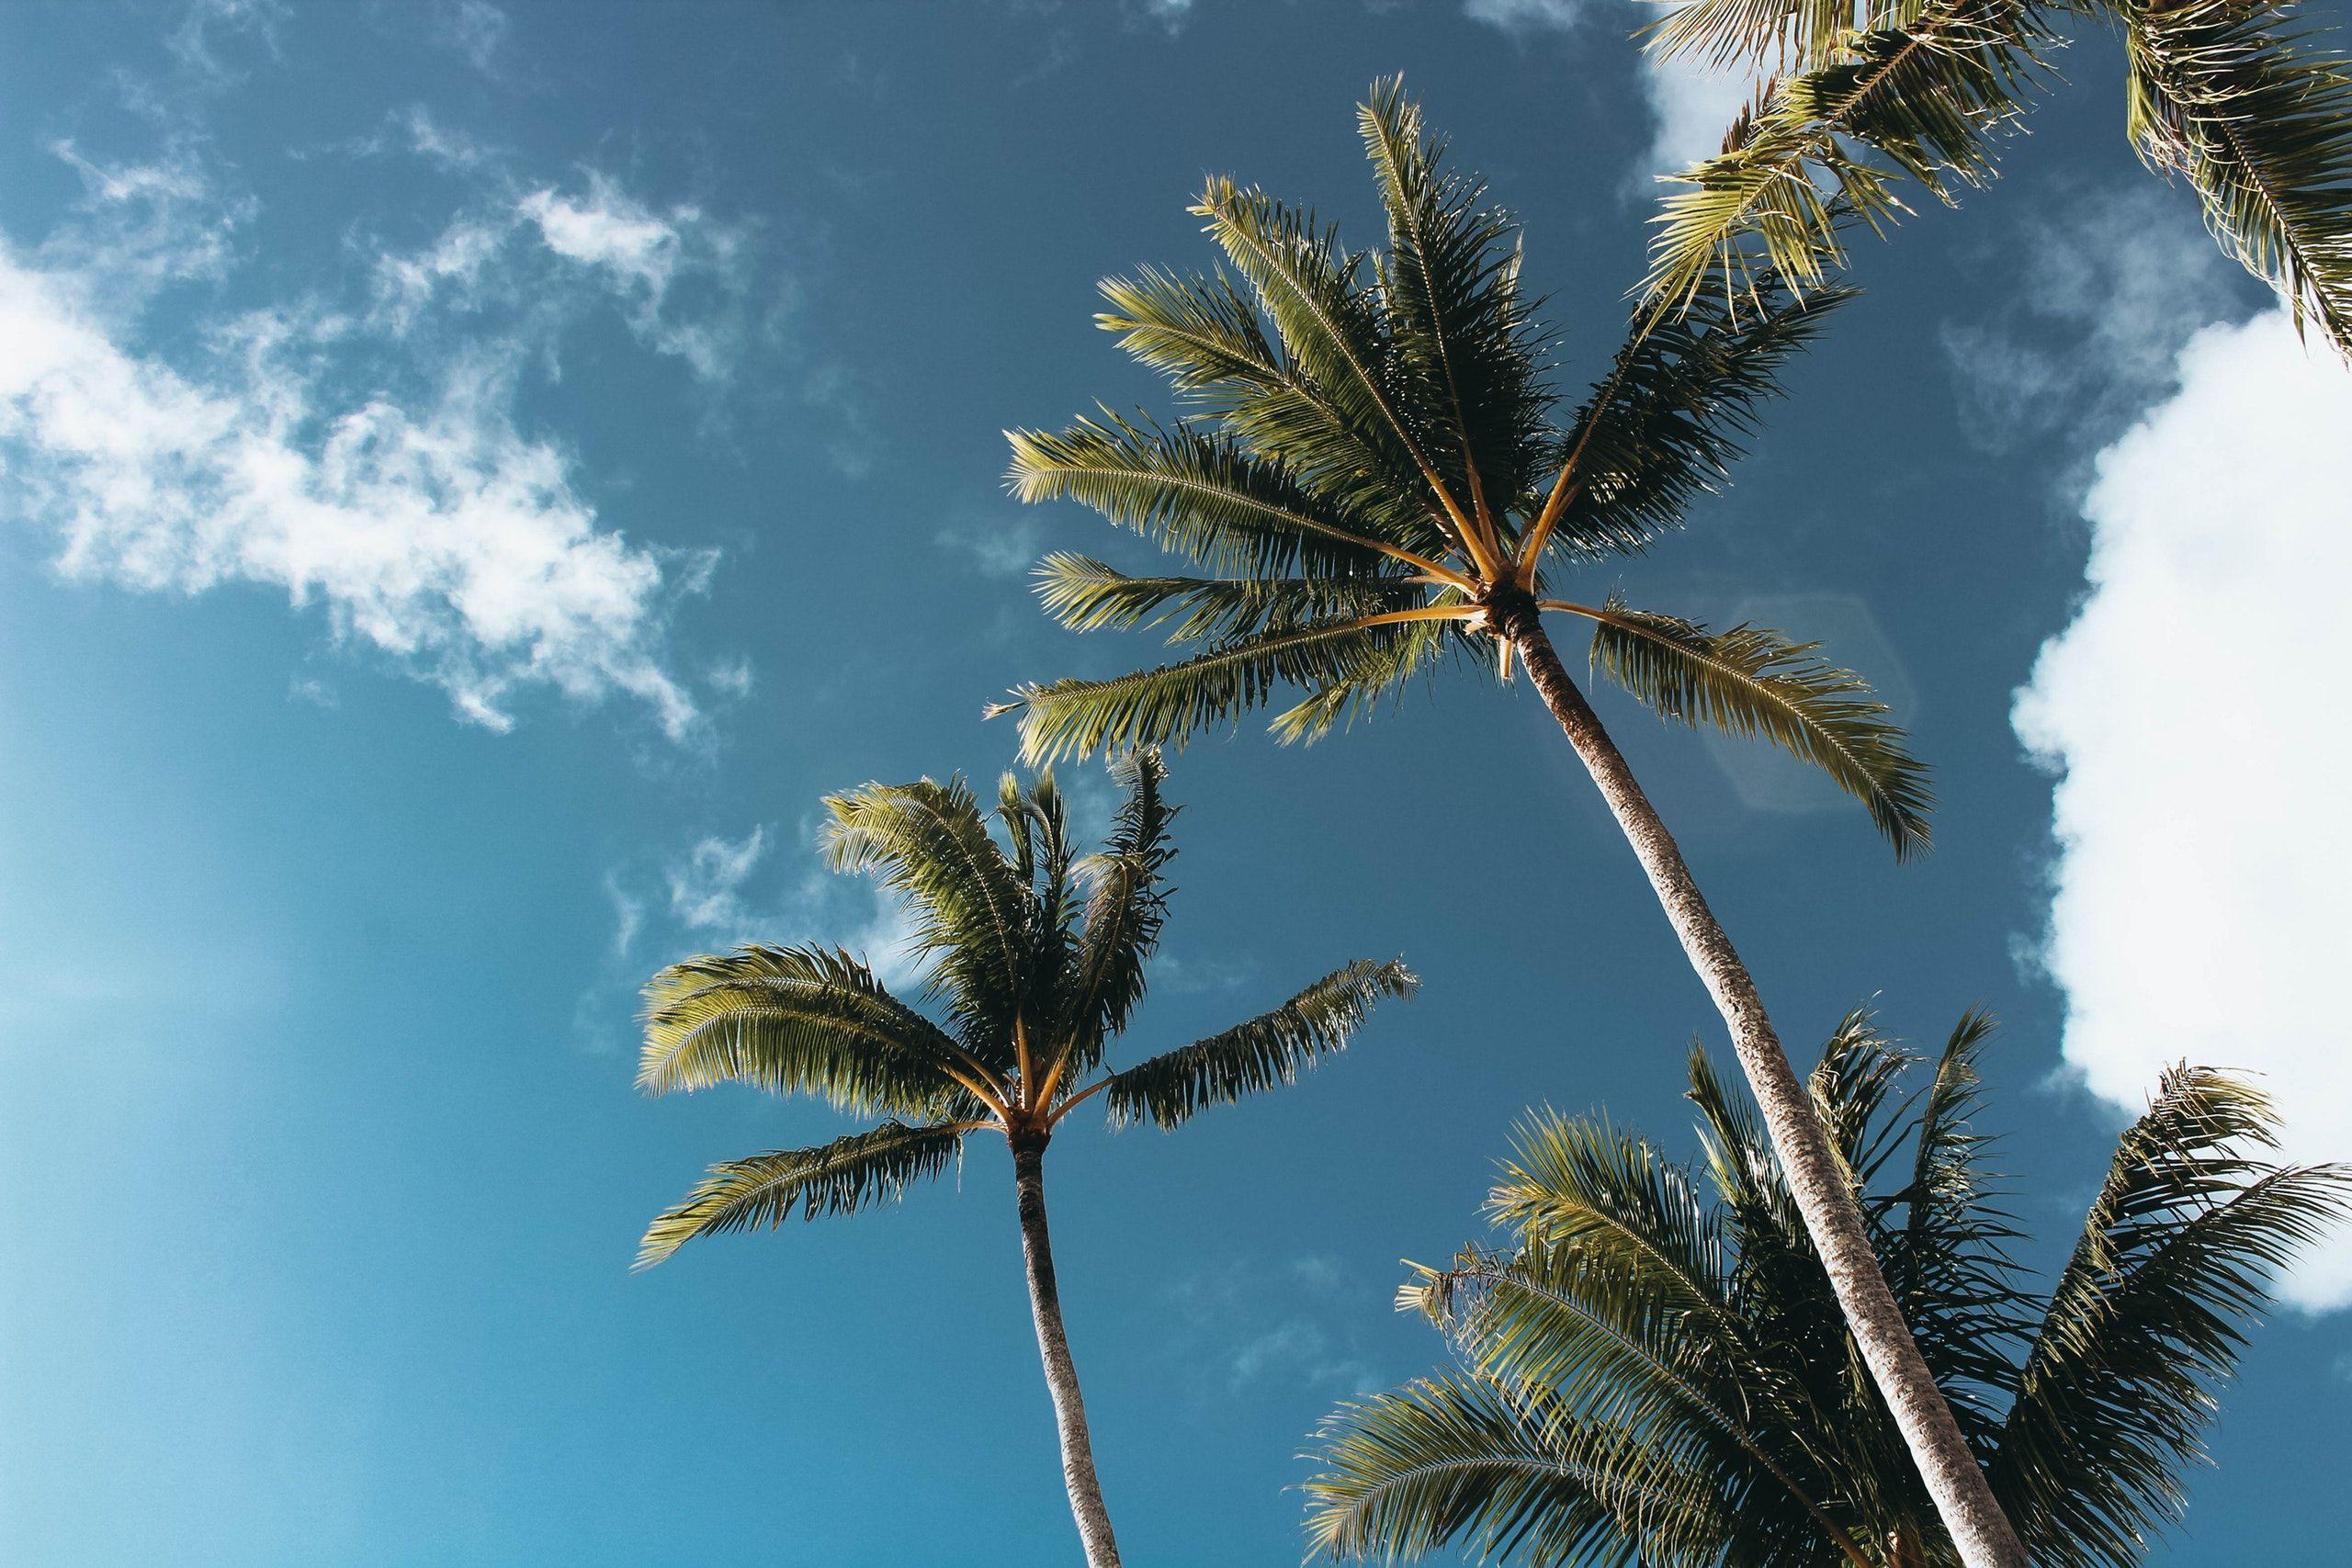 Daytime View Of California Palm Tree Wallpaper - Palm Trees Wallpaper Hd - HD Wallpaper